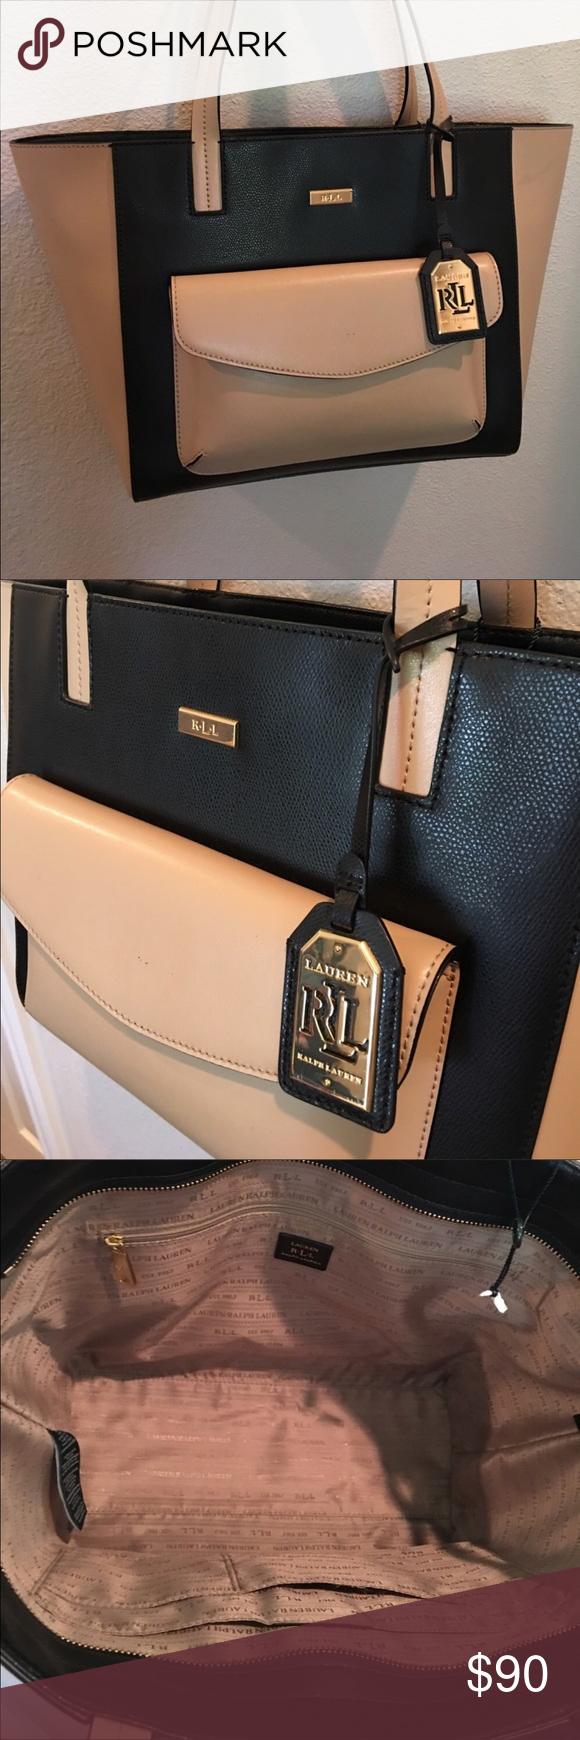 6a31660b06d Ralph Lauren RRL Handbag Tote Excellent Condition Ralph Lauren RRL blocked  black   beige handbag tote, Great condition. Used once.